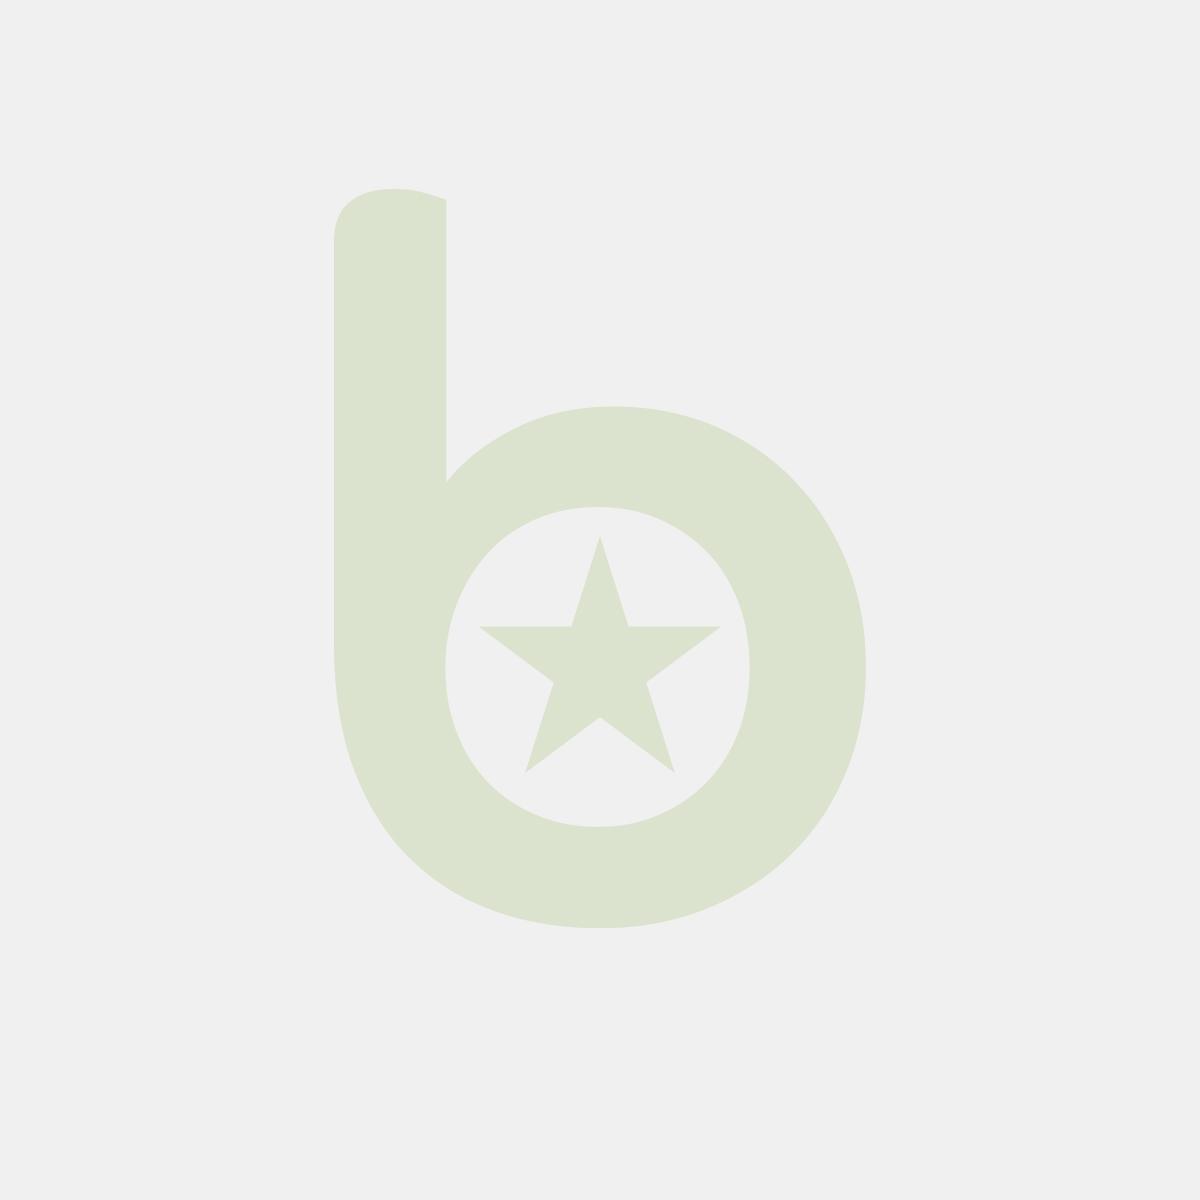 Kubek brąz-biały (pion. prążkowany) 180ml PS, cena za 100 sztuk